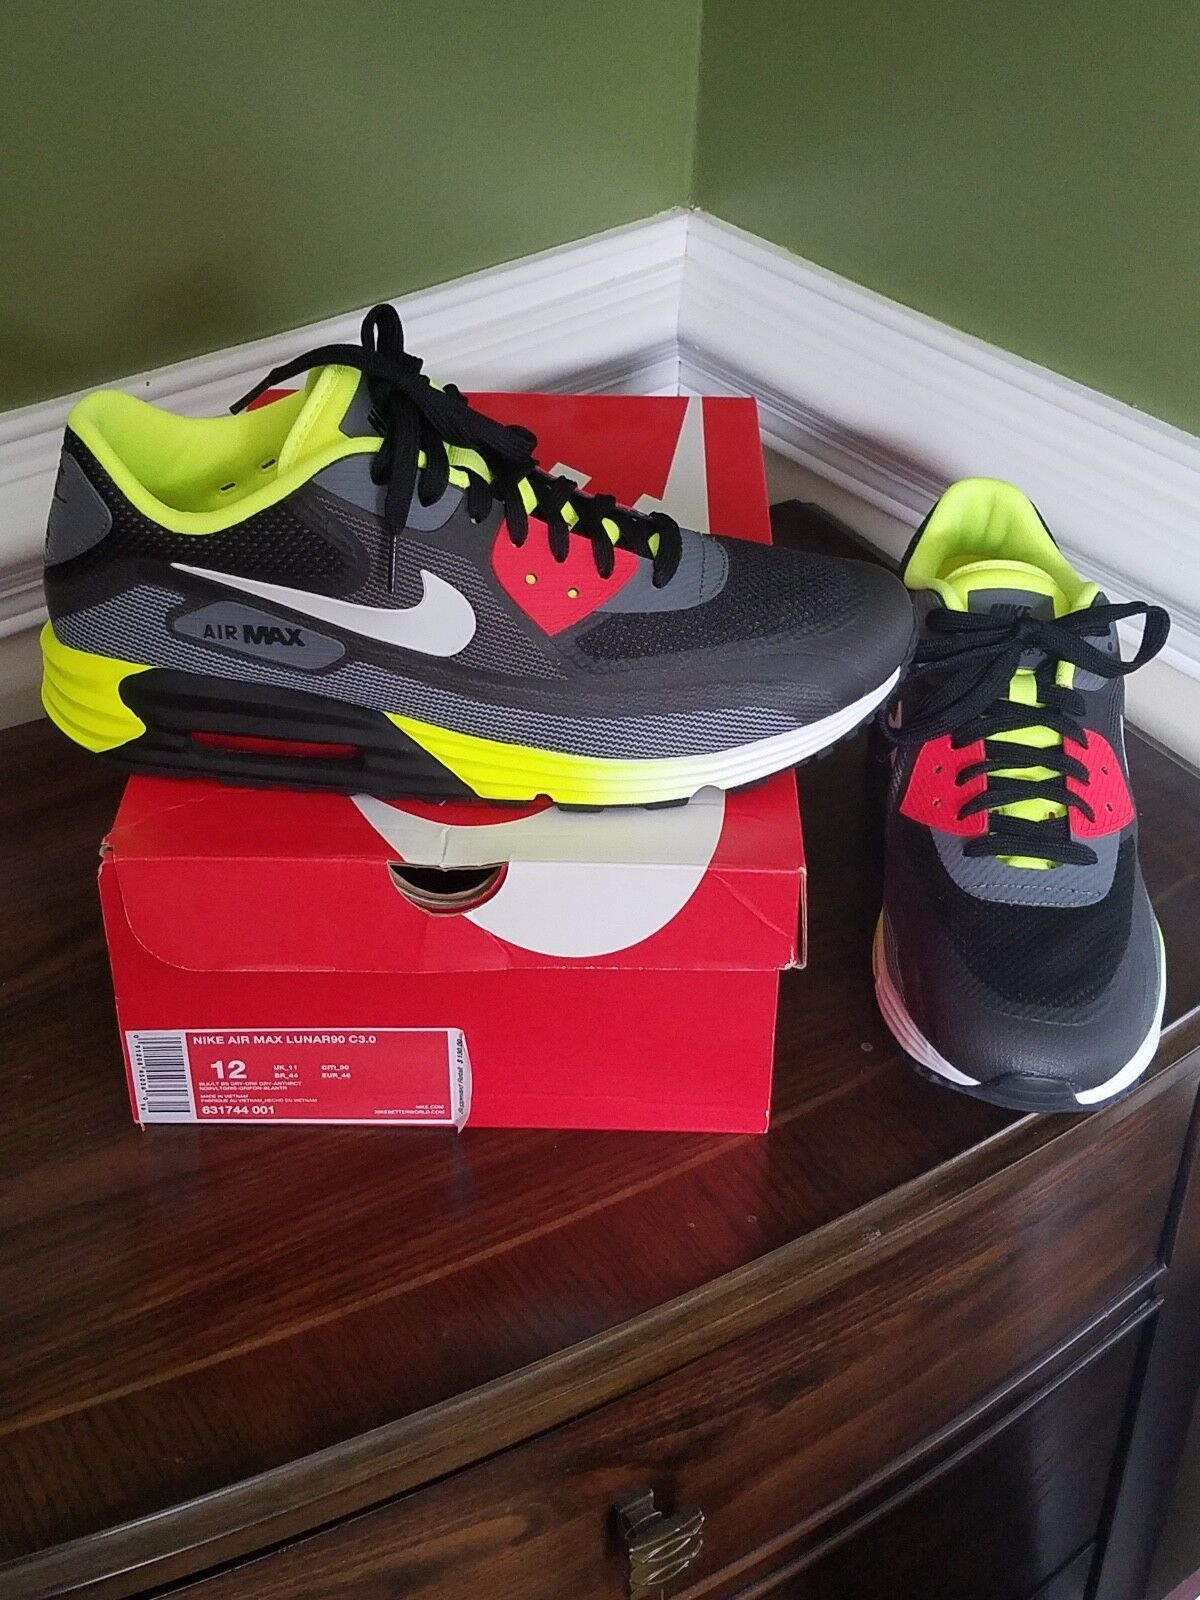 "Nike Air Max Lunar 90 C3.0 ""Black Volt"" US Mens size 12 [631744-001]"